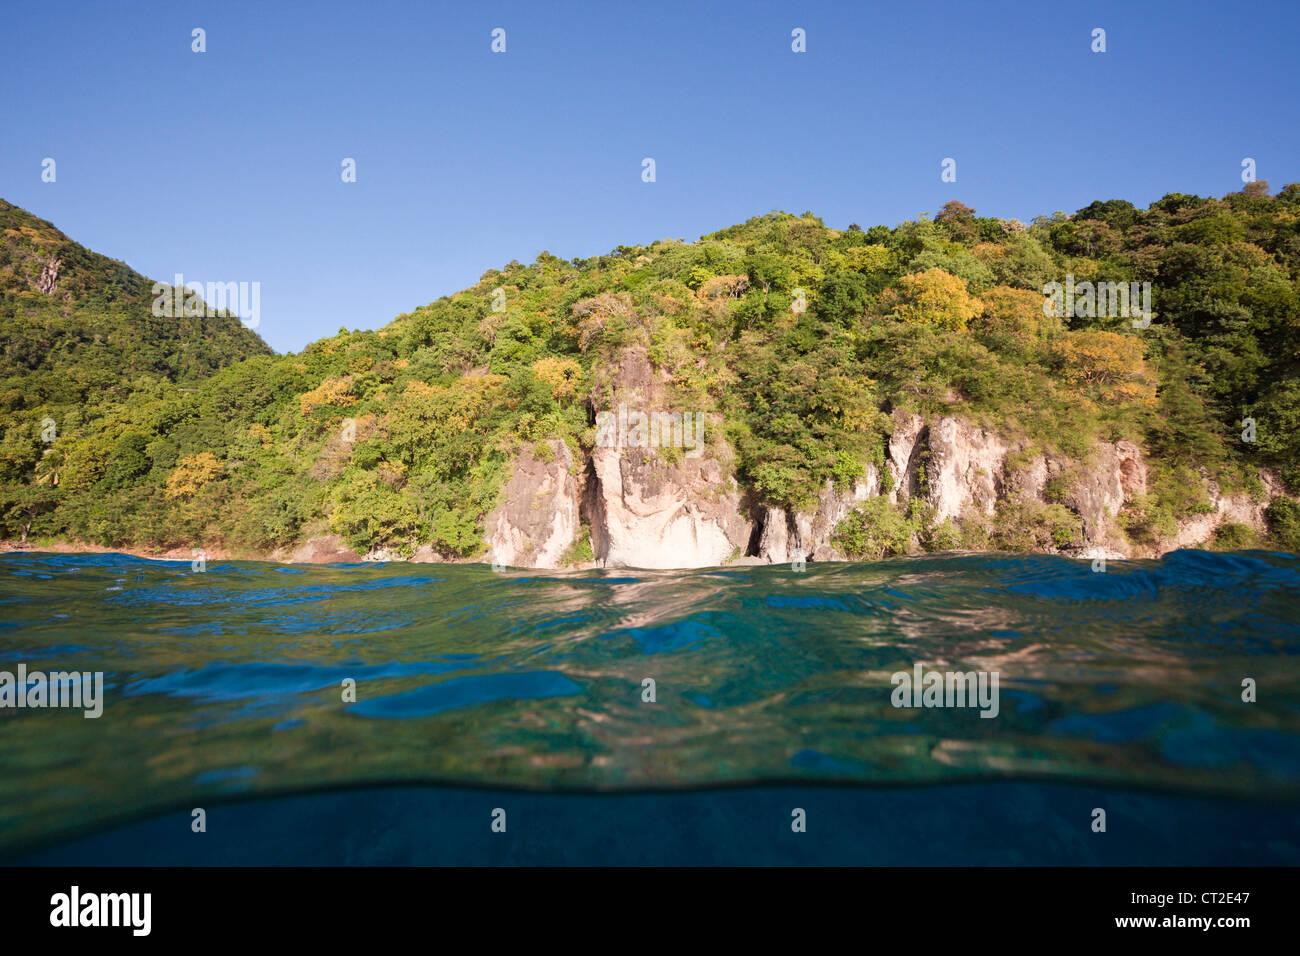 Küste von Dominica, Karibik, Dominica Stockbild